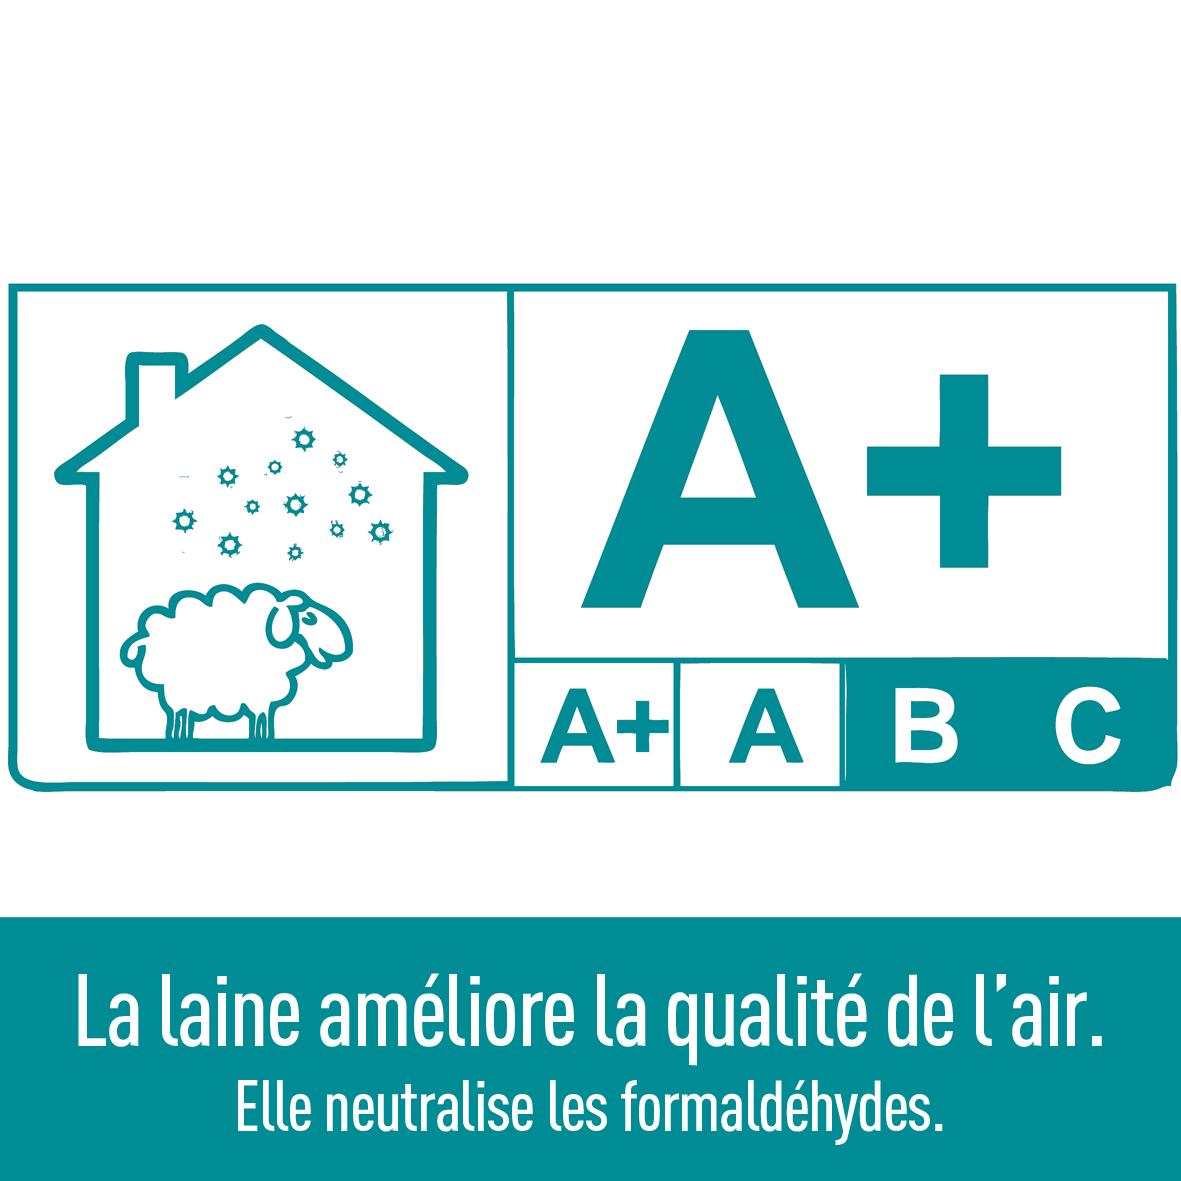 laine-purifie-air-neutralise-formaldehydes-plante-ardelaine